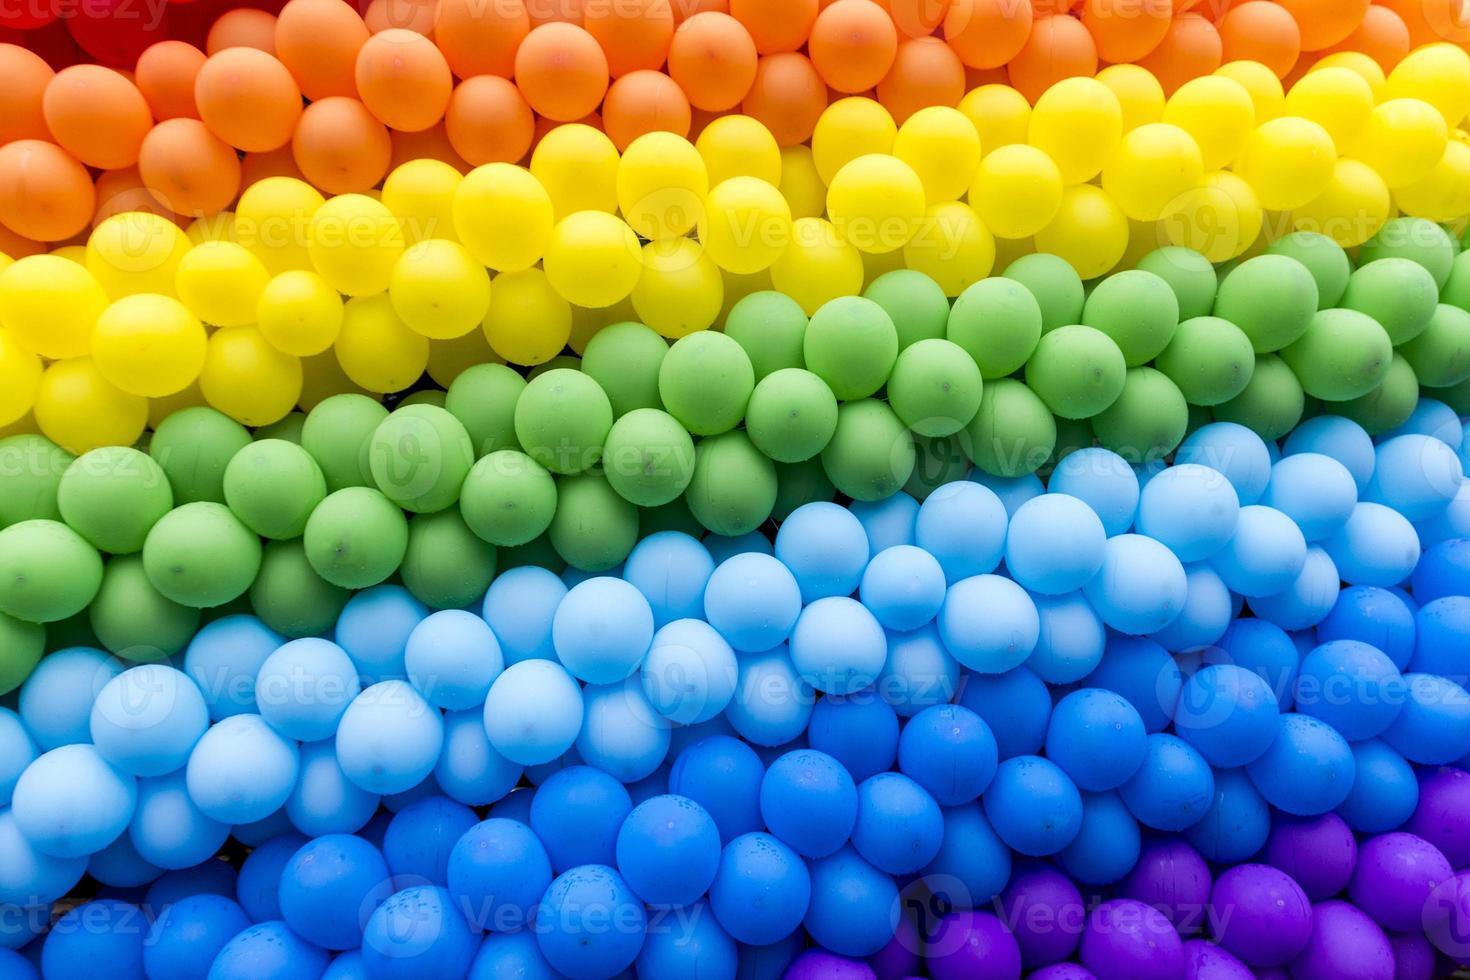 felgekleurde ballonnen foto